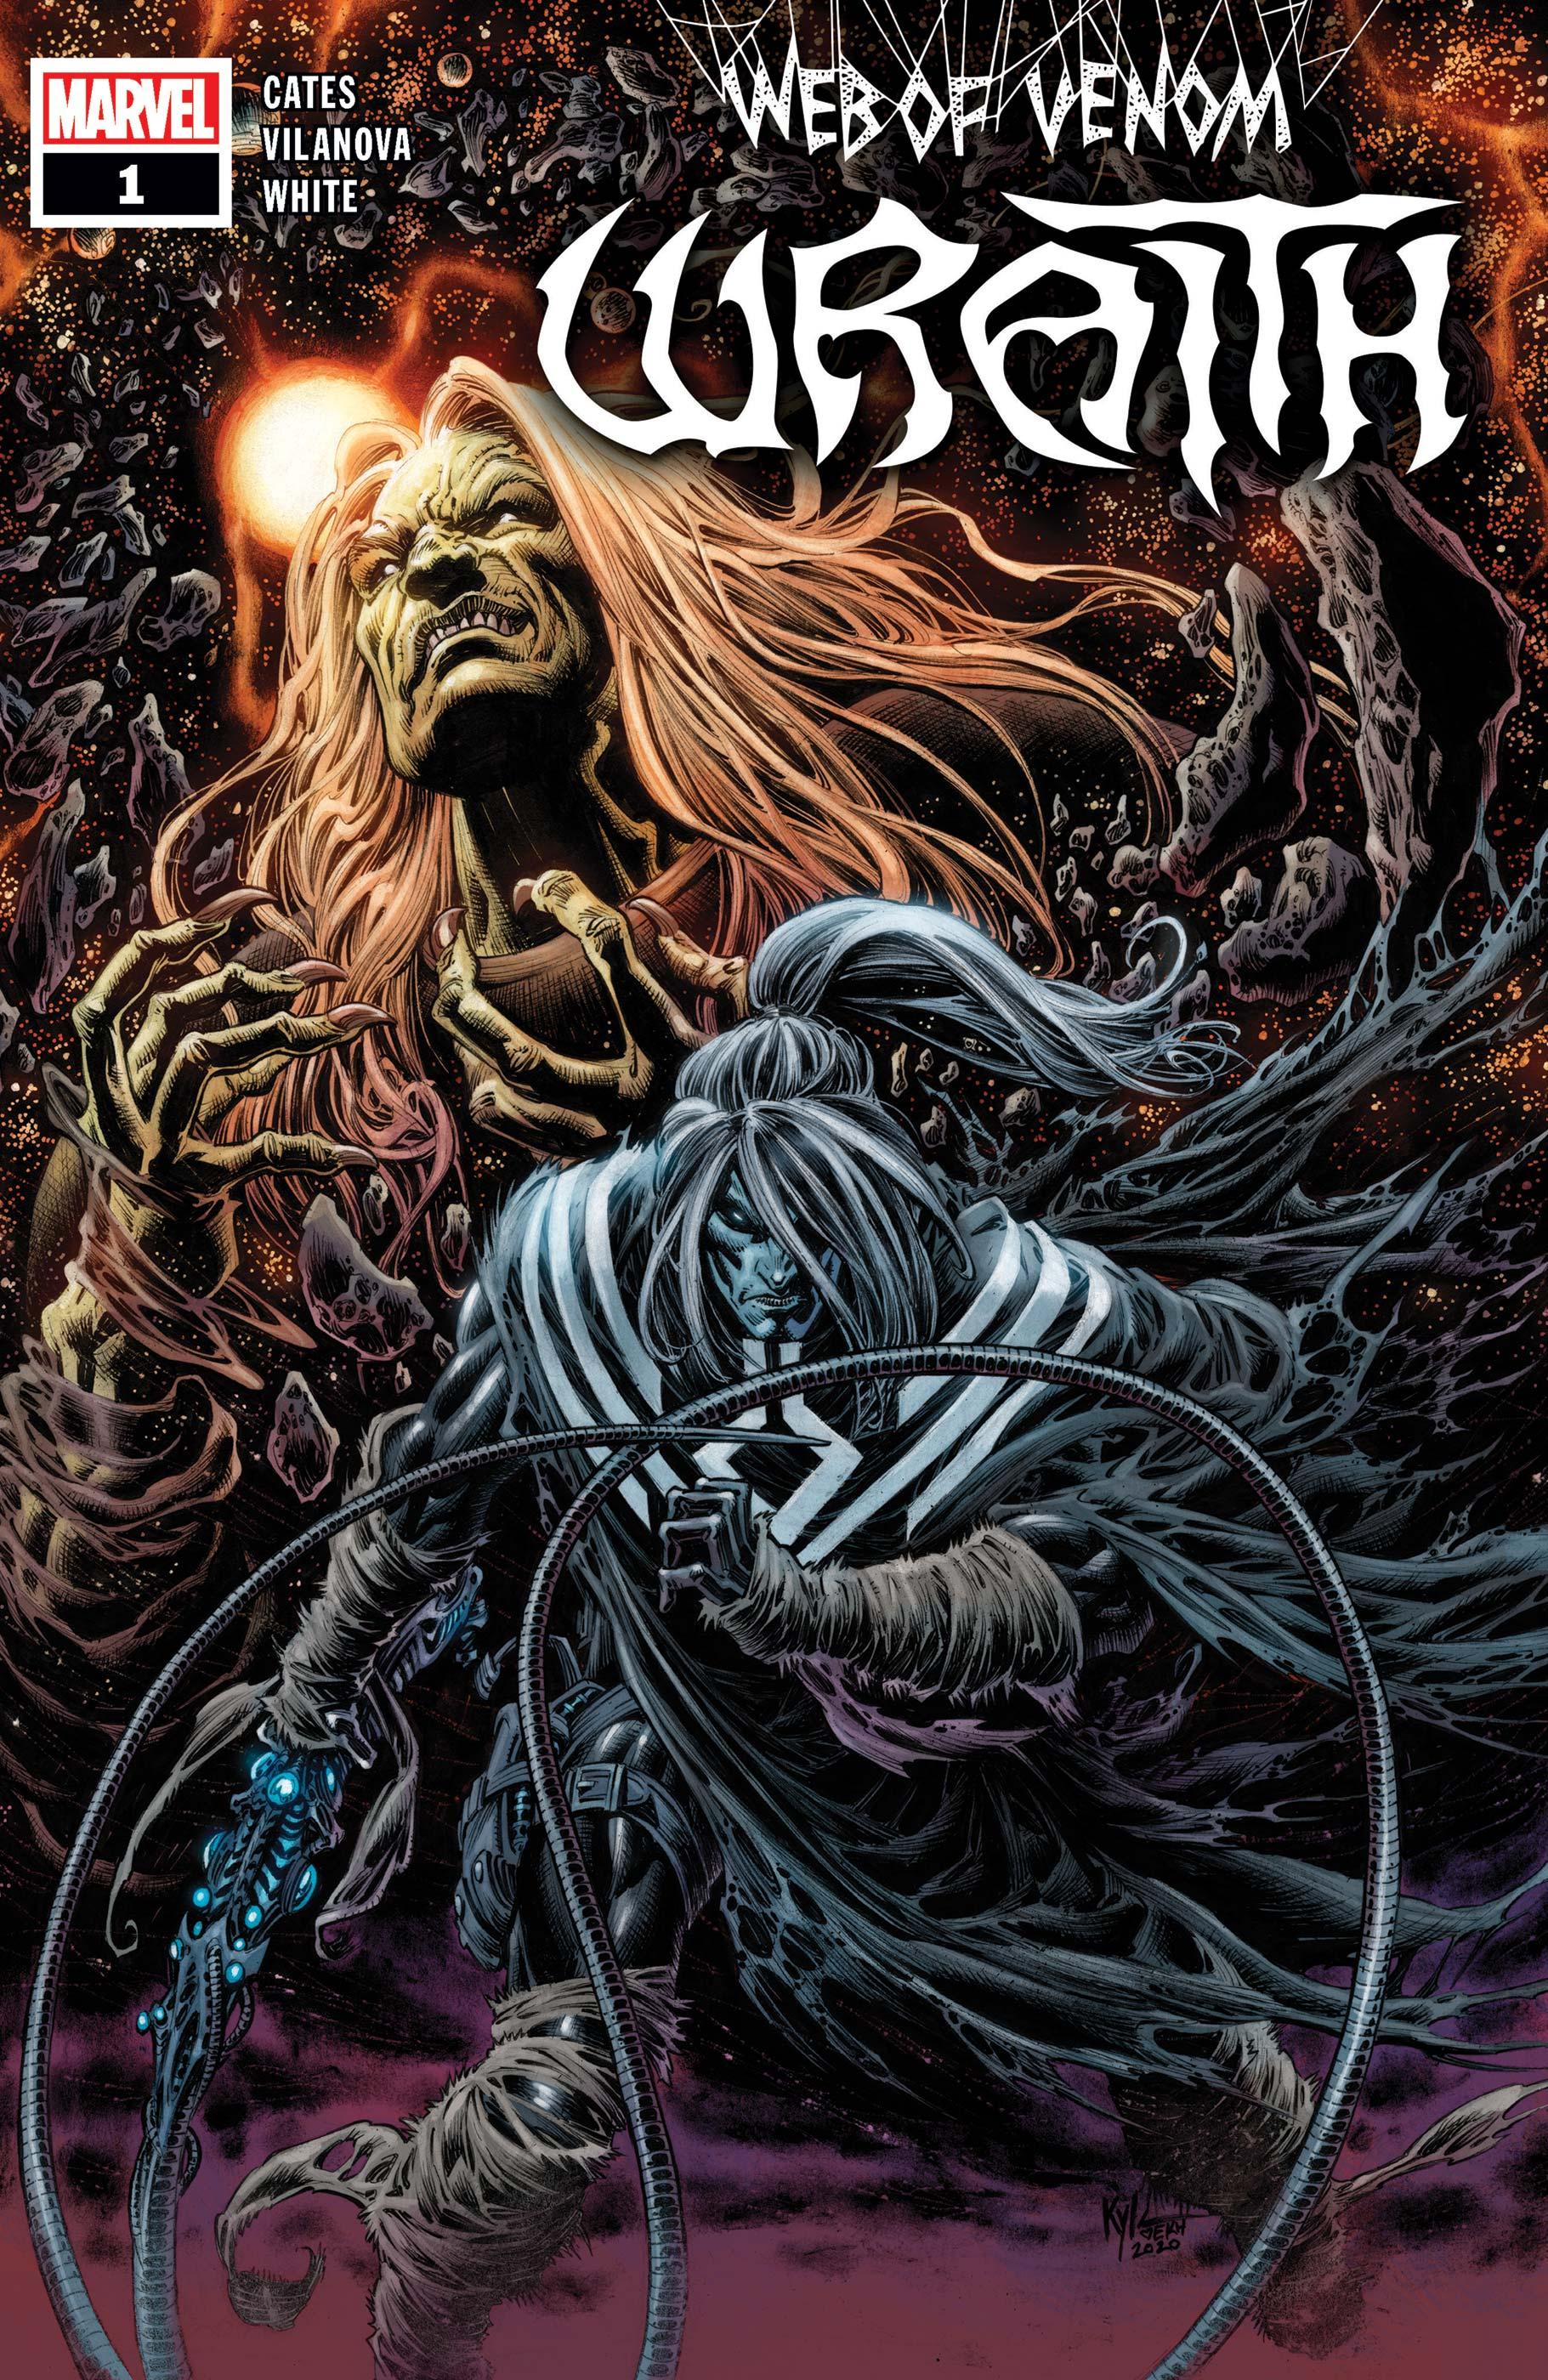 Web of Venom: Wraith (2020) #1